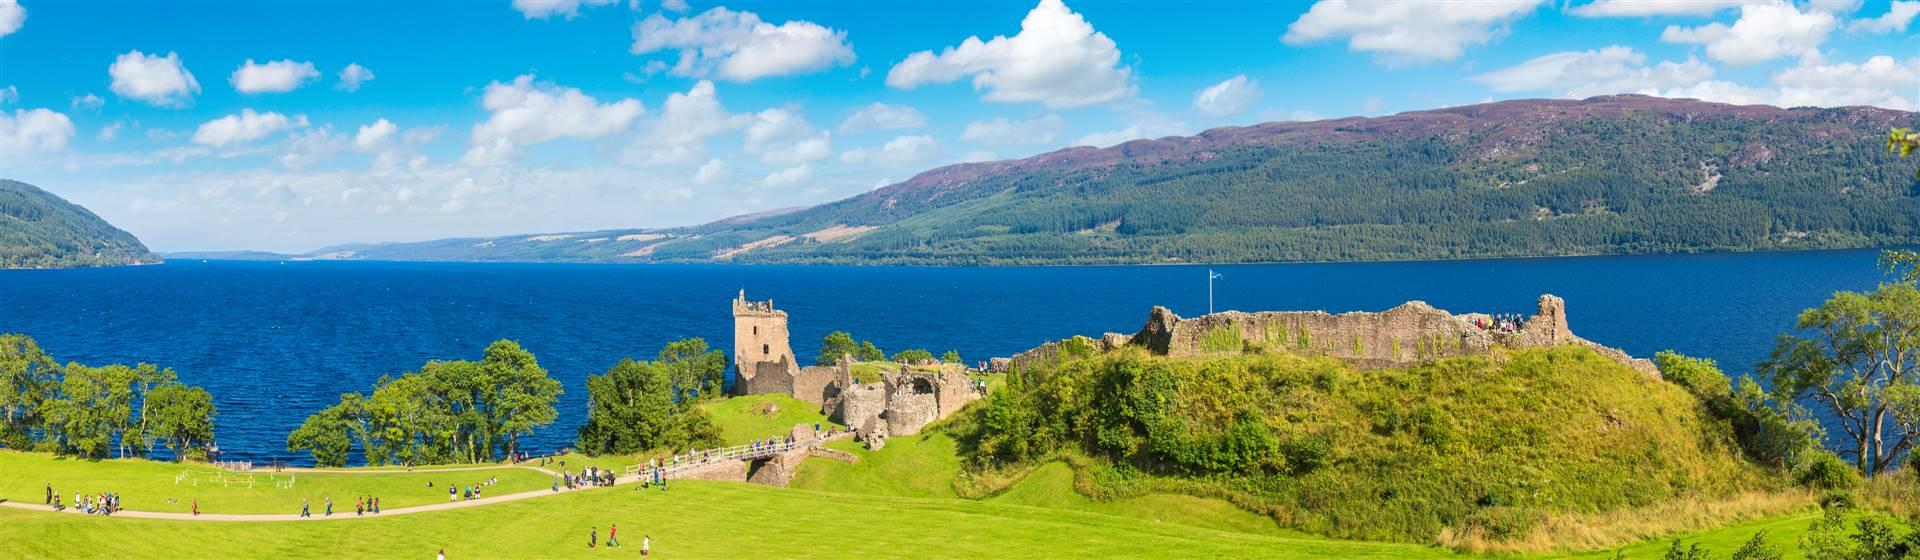 "<img src=""urquartcastleandlochness-shutterstock.jpeg"" alt=""Urquart Castle and Loch Ness""/>"